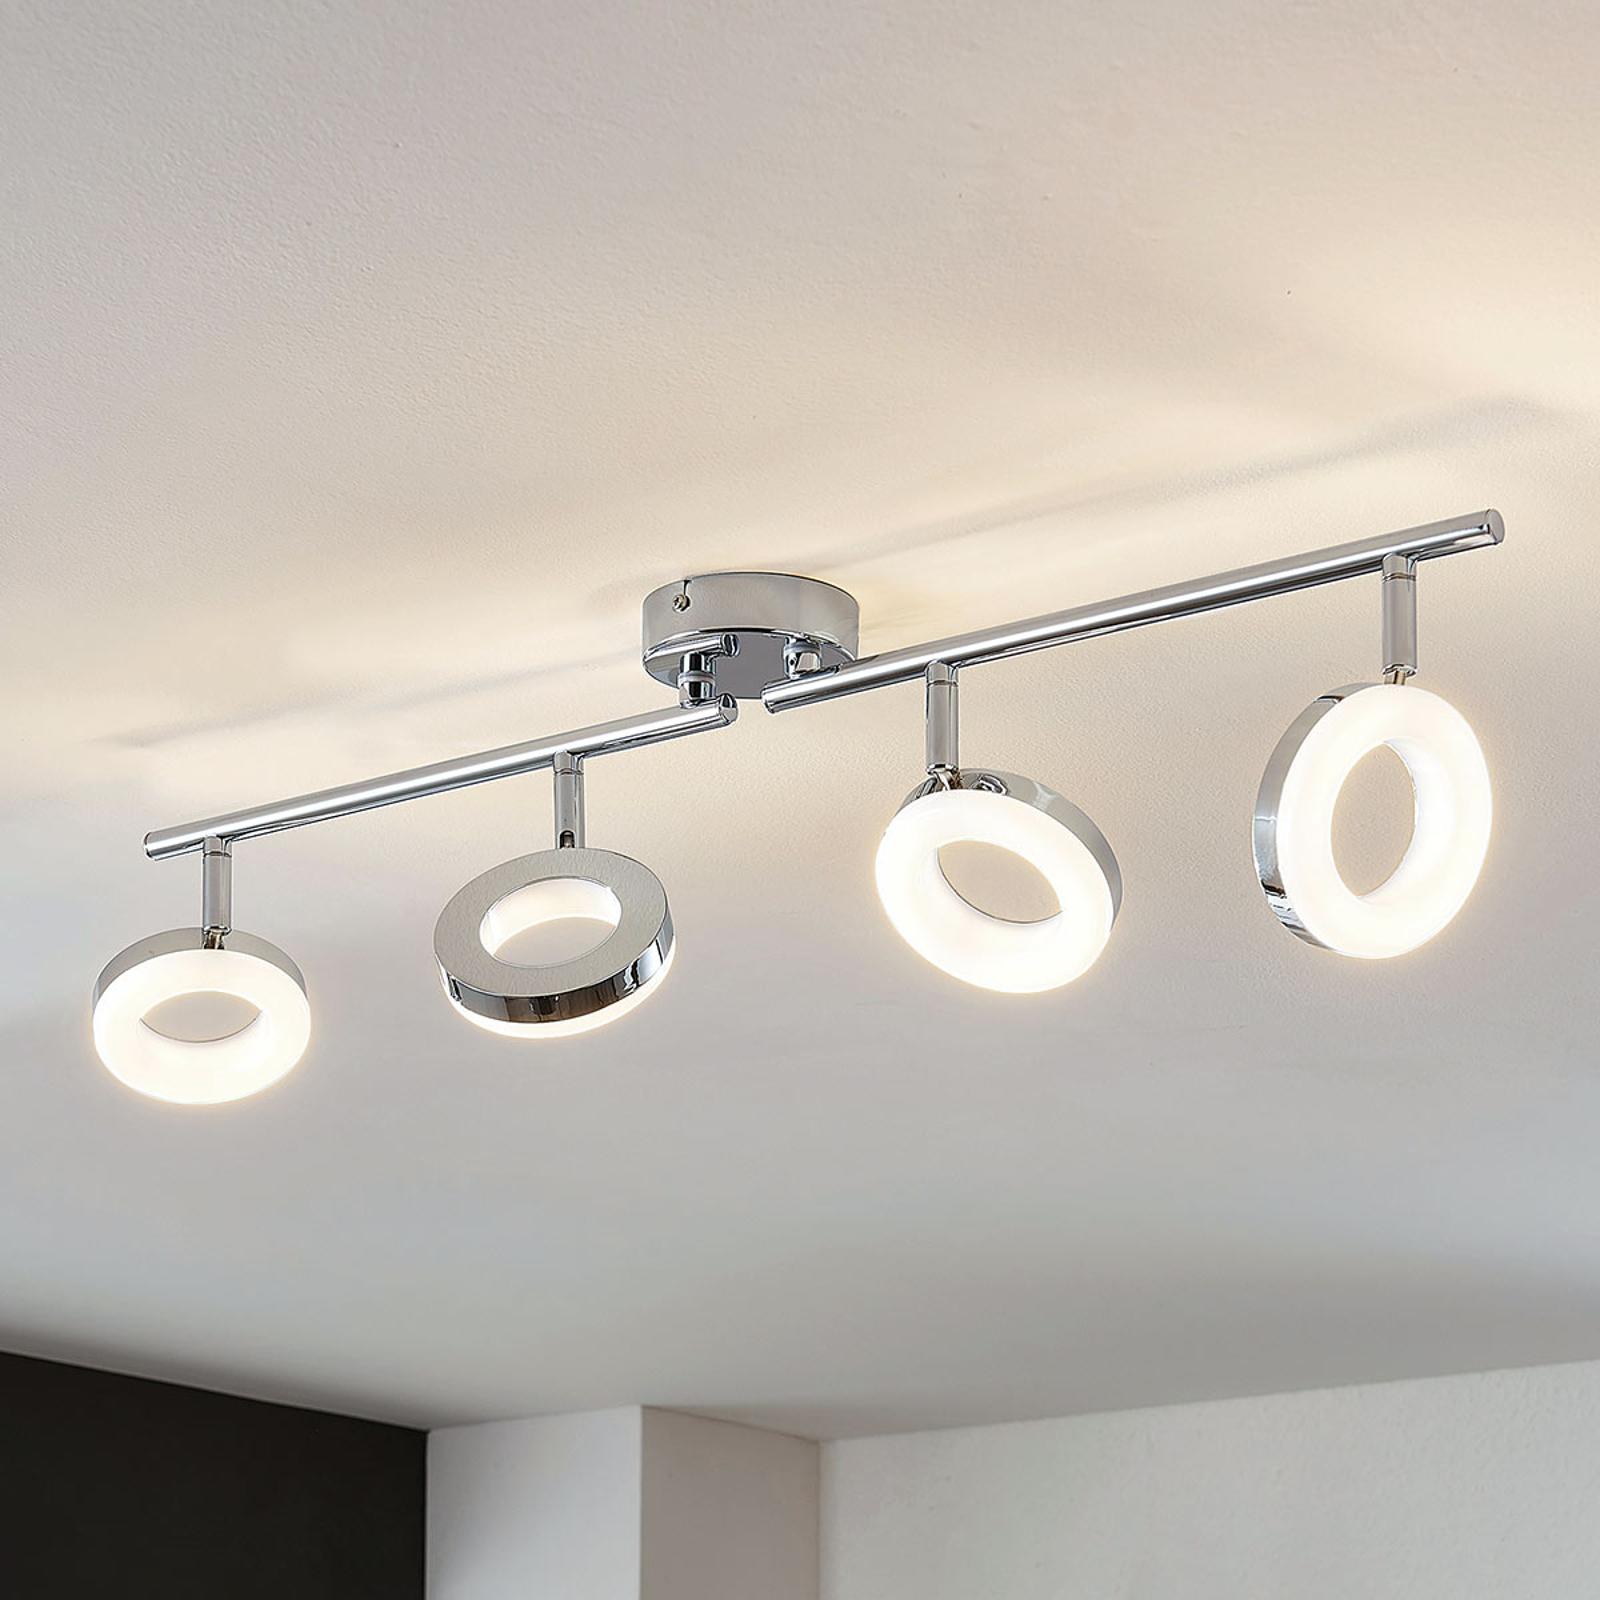 Lampa sufitowa LED Ringo 4-punktowa